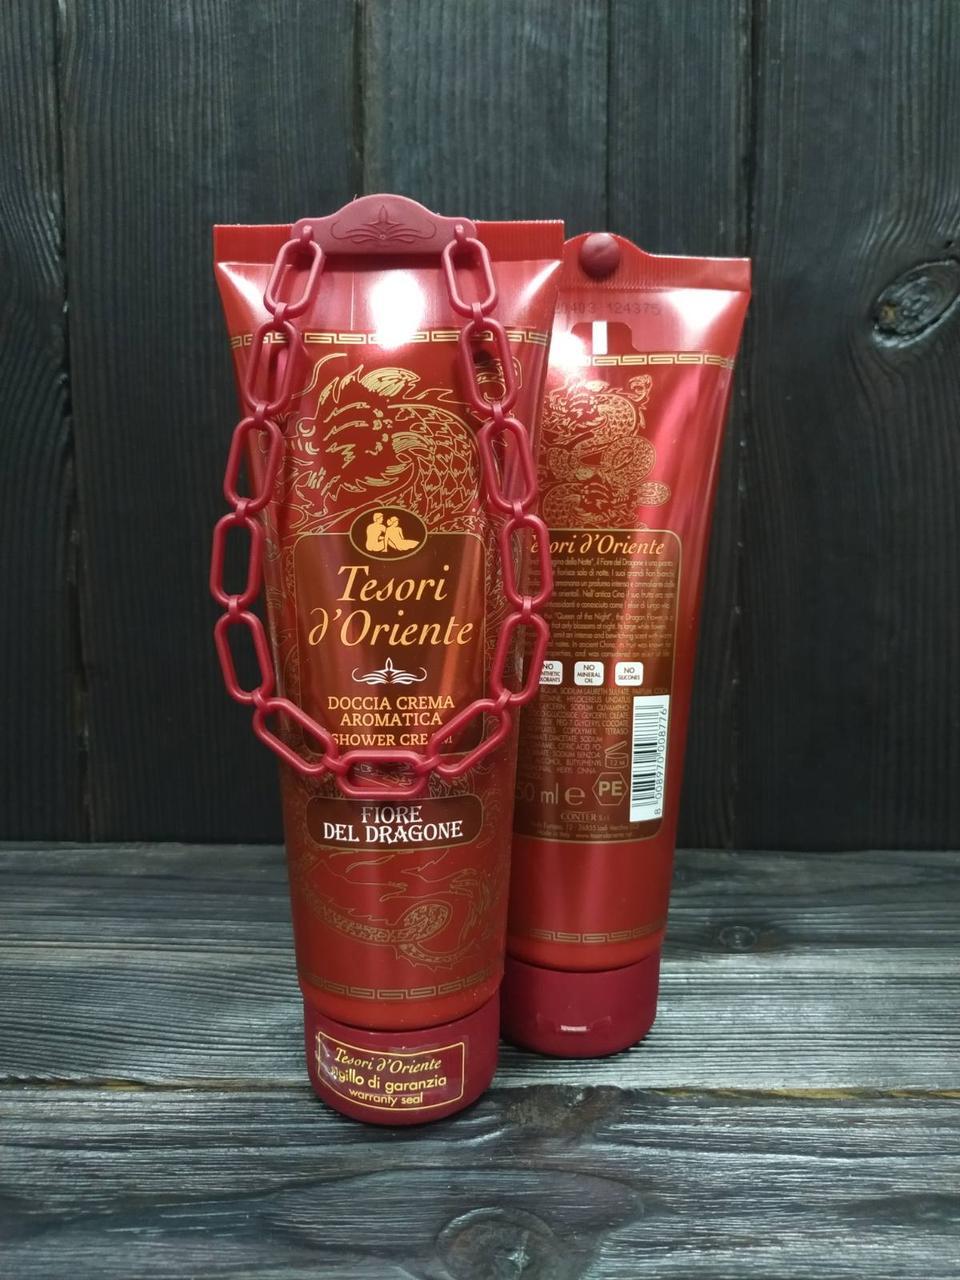 Tesori d`Oriente Fiore del Dragone Гель-крем для душа Цветок дракона, 250 мл